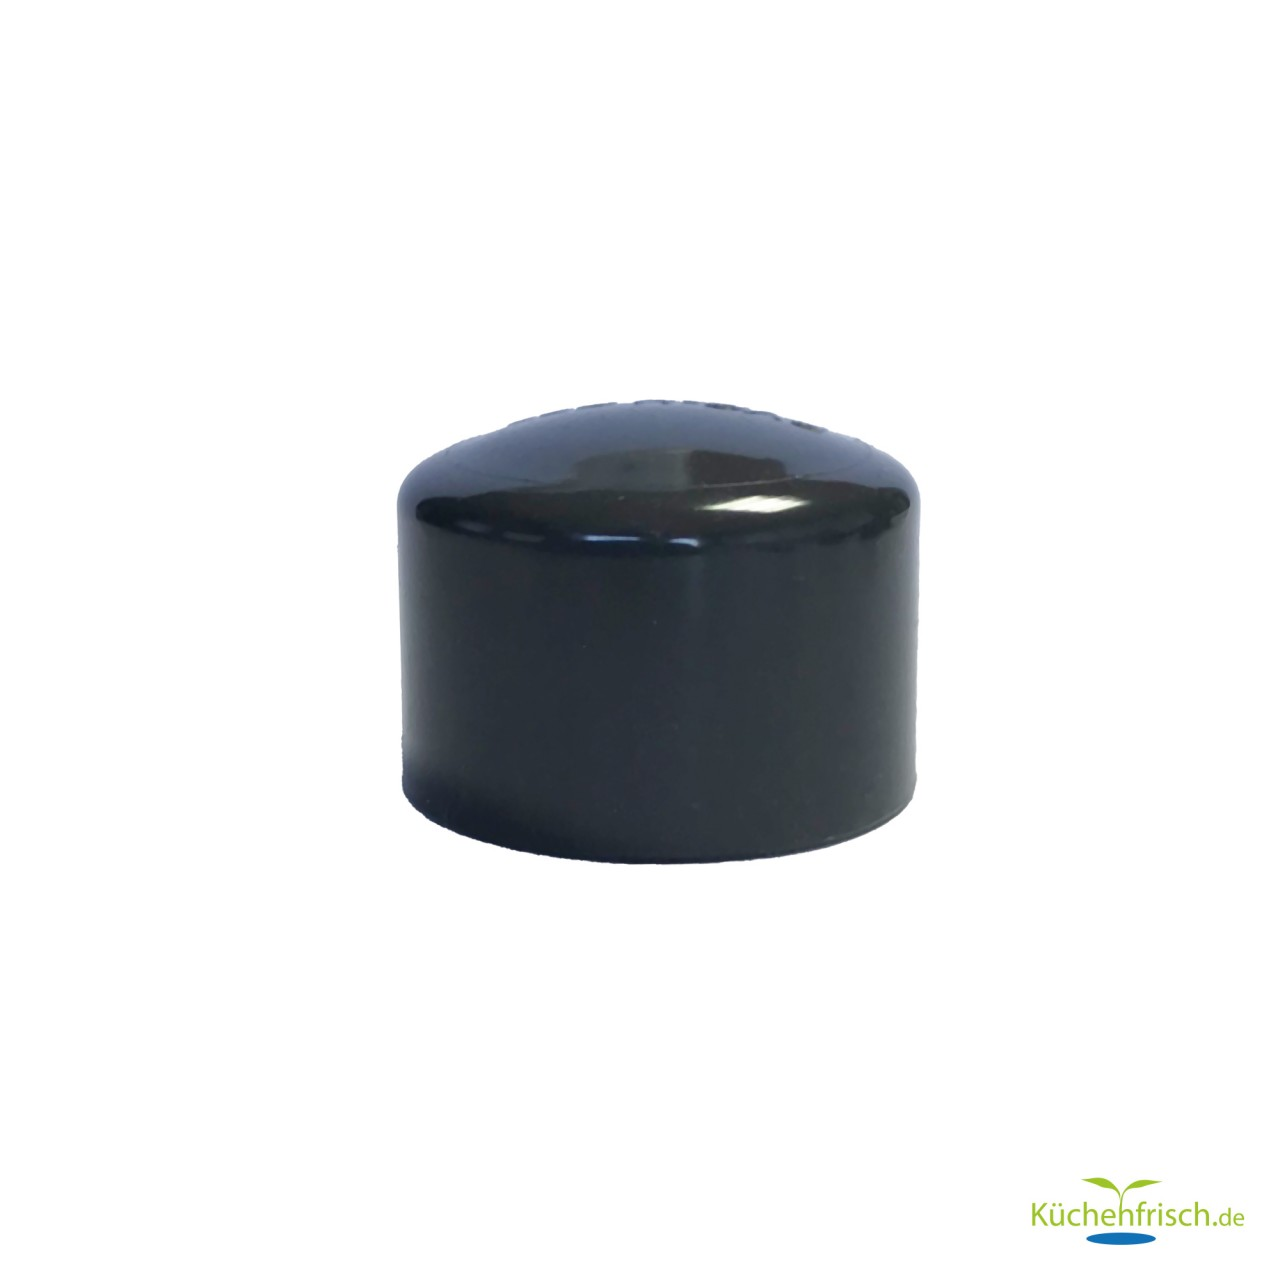 PVC-U Klebekappe für 32 mm Rohre für NFT-Vertikalsystem